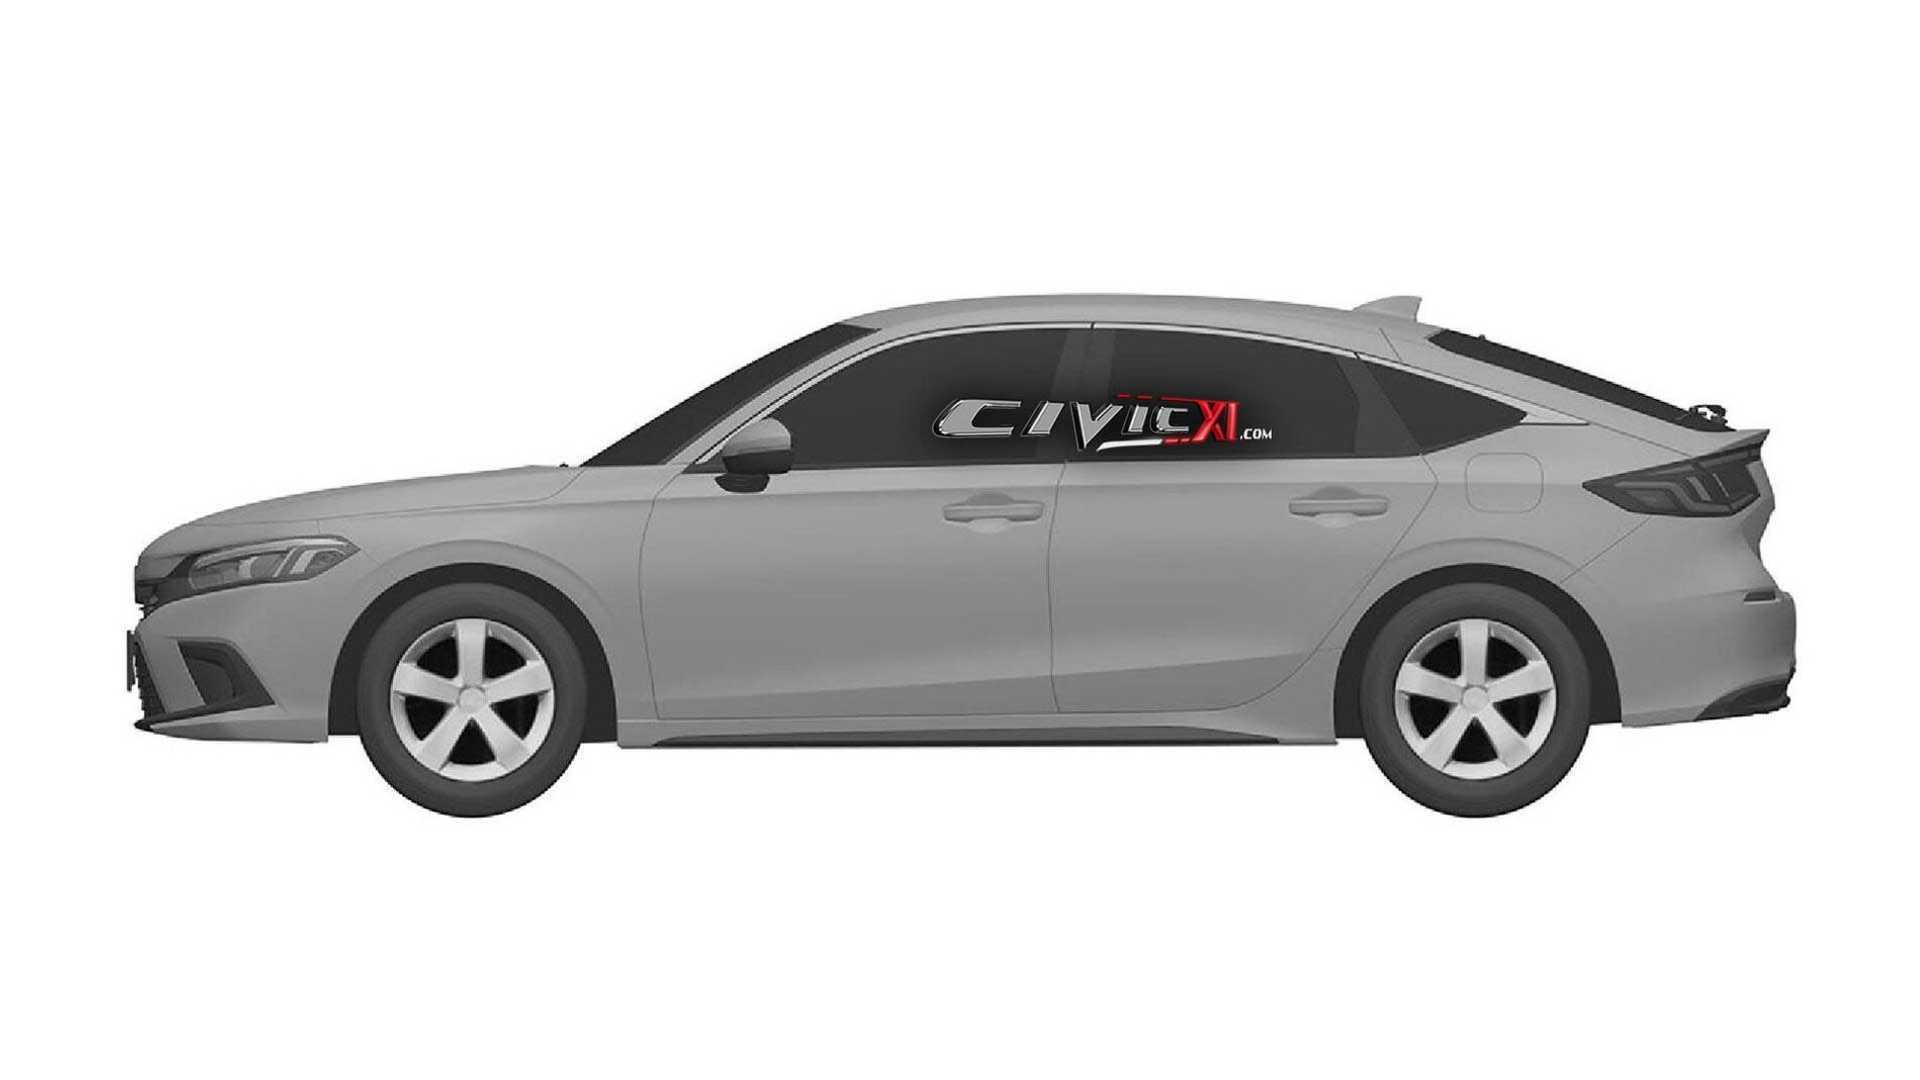 honda-civic-11th-generation-design-trademark-driver-side